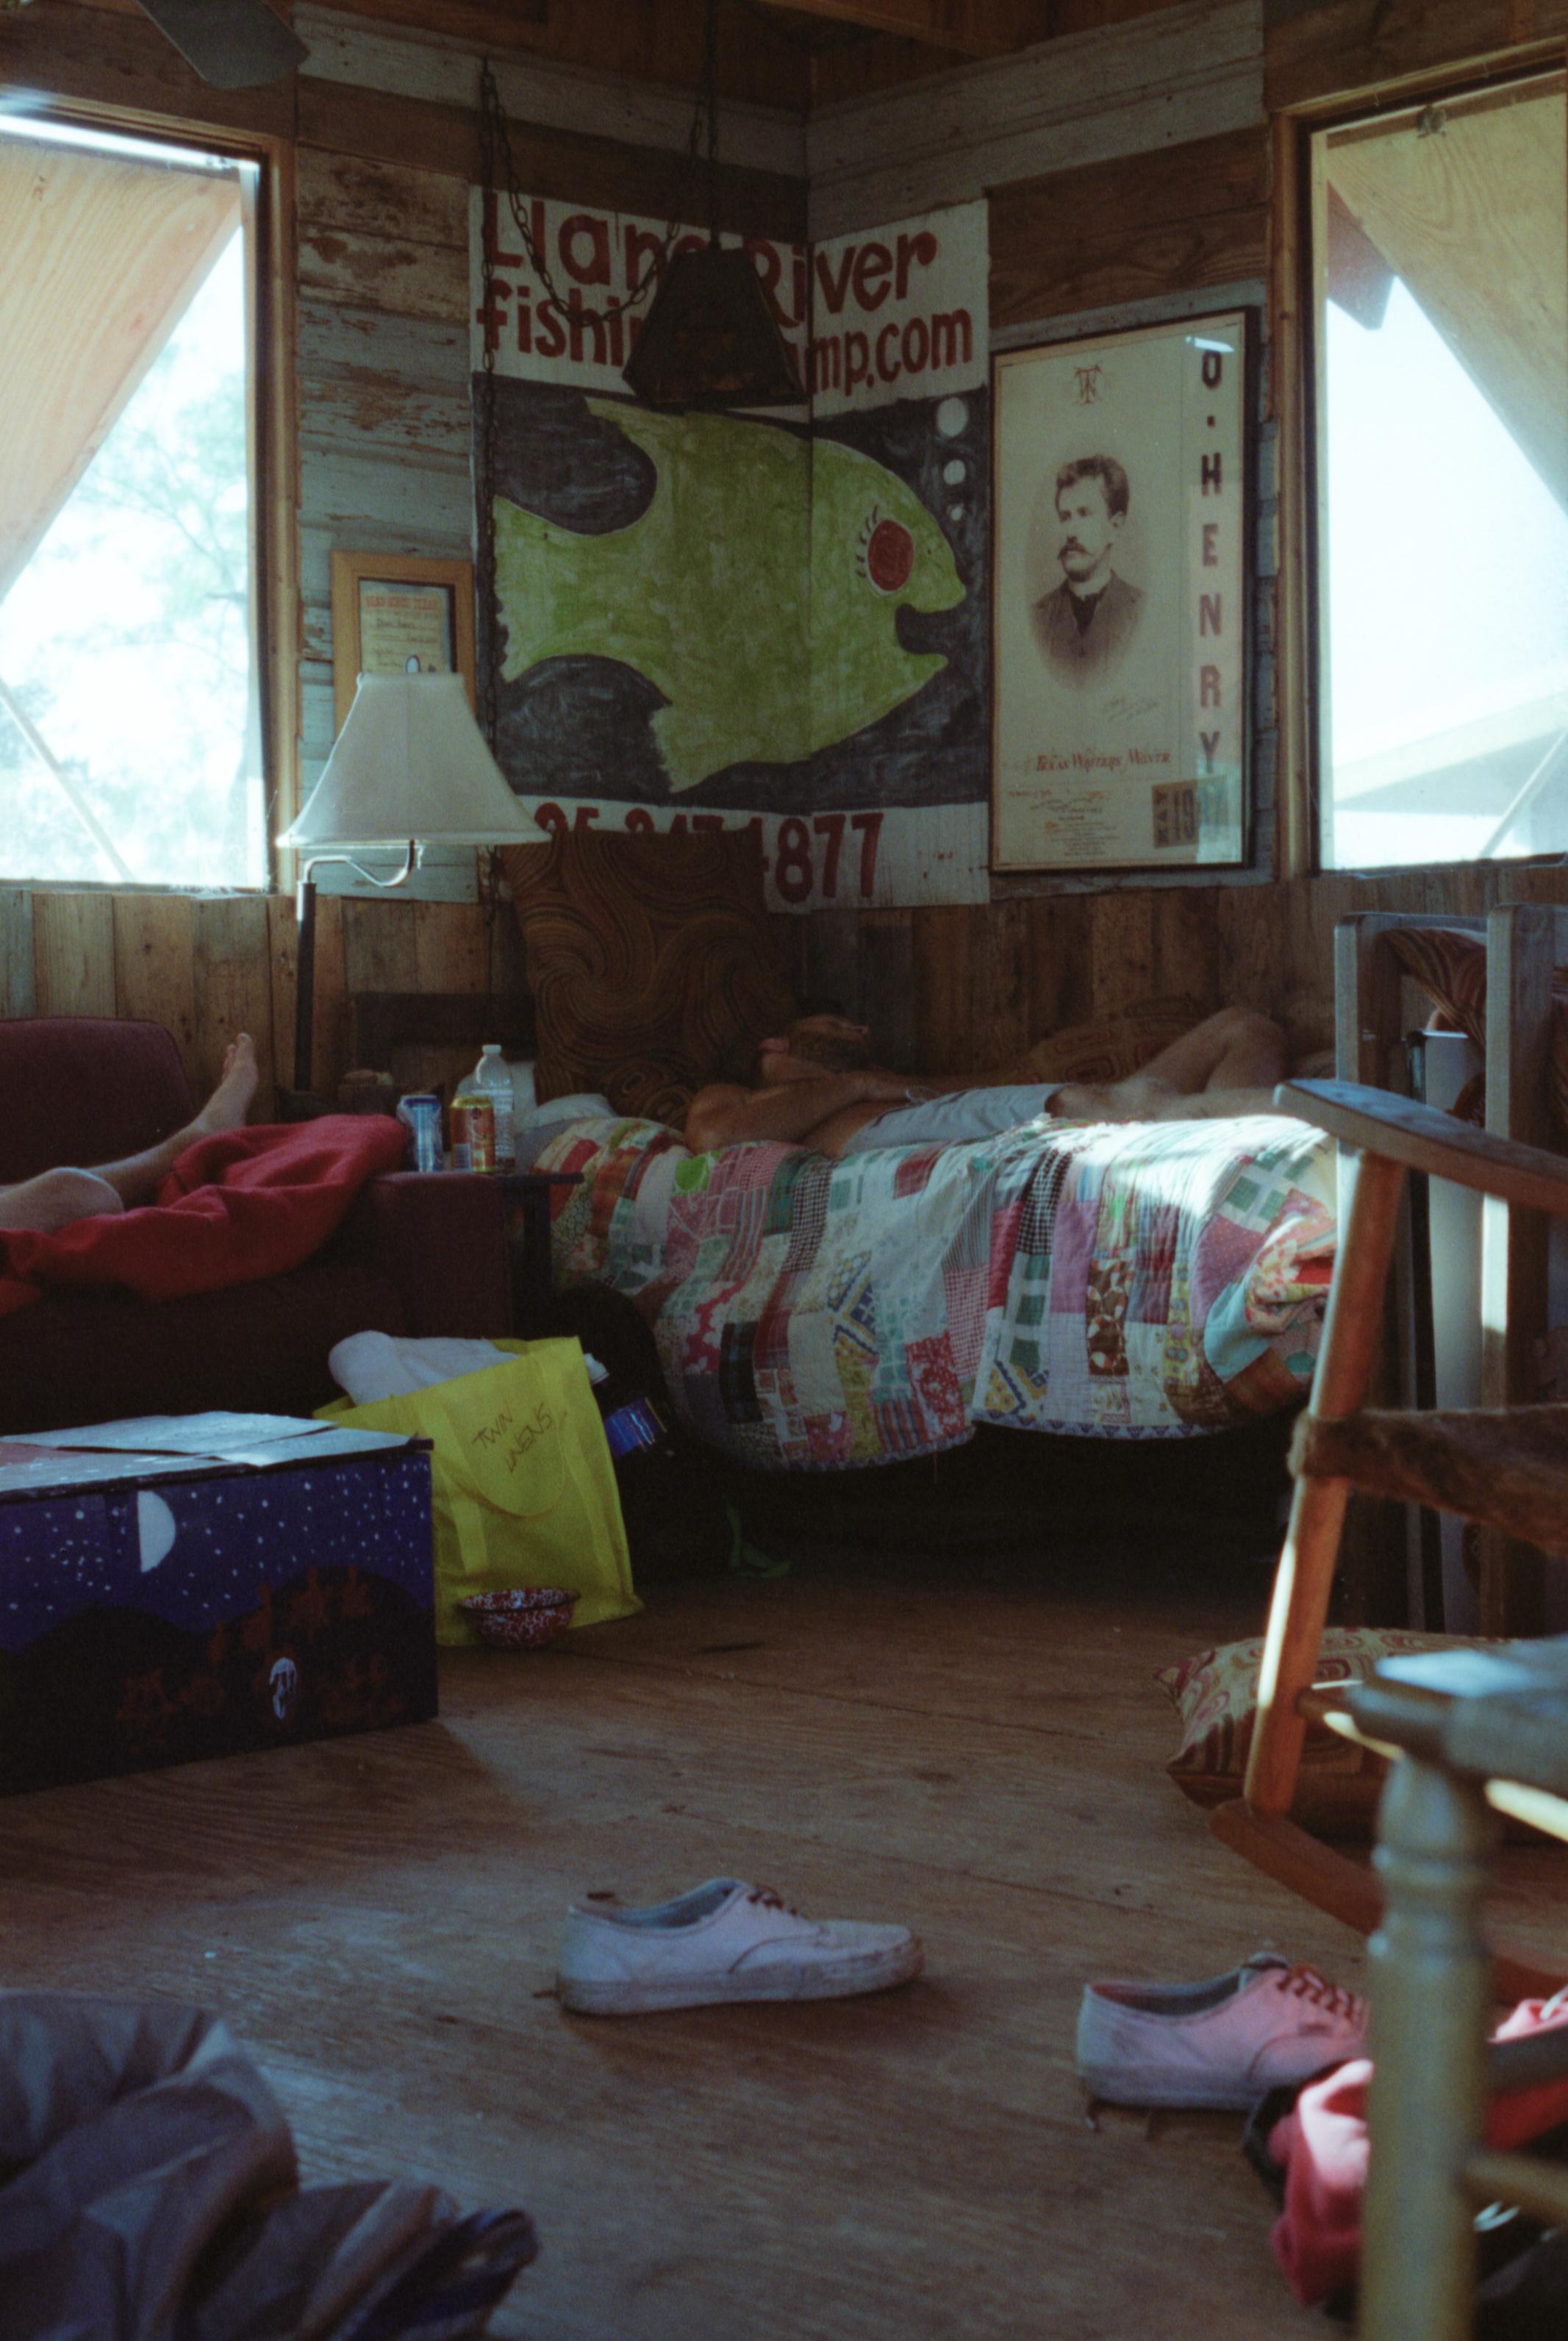 llano texas camping camp pawlwoski whatley 35mm film